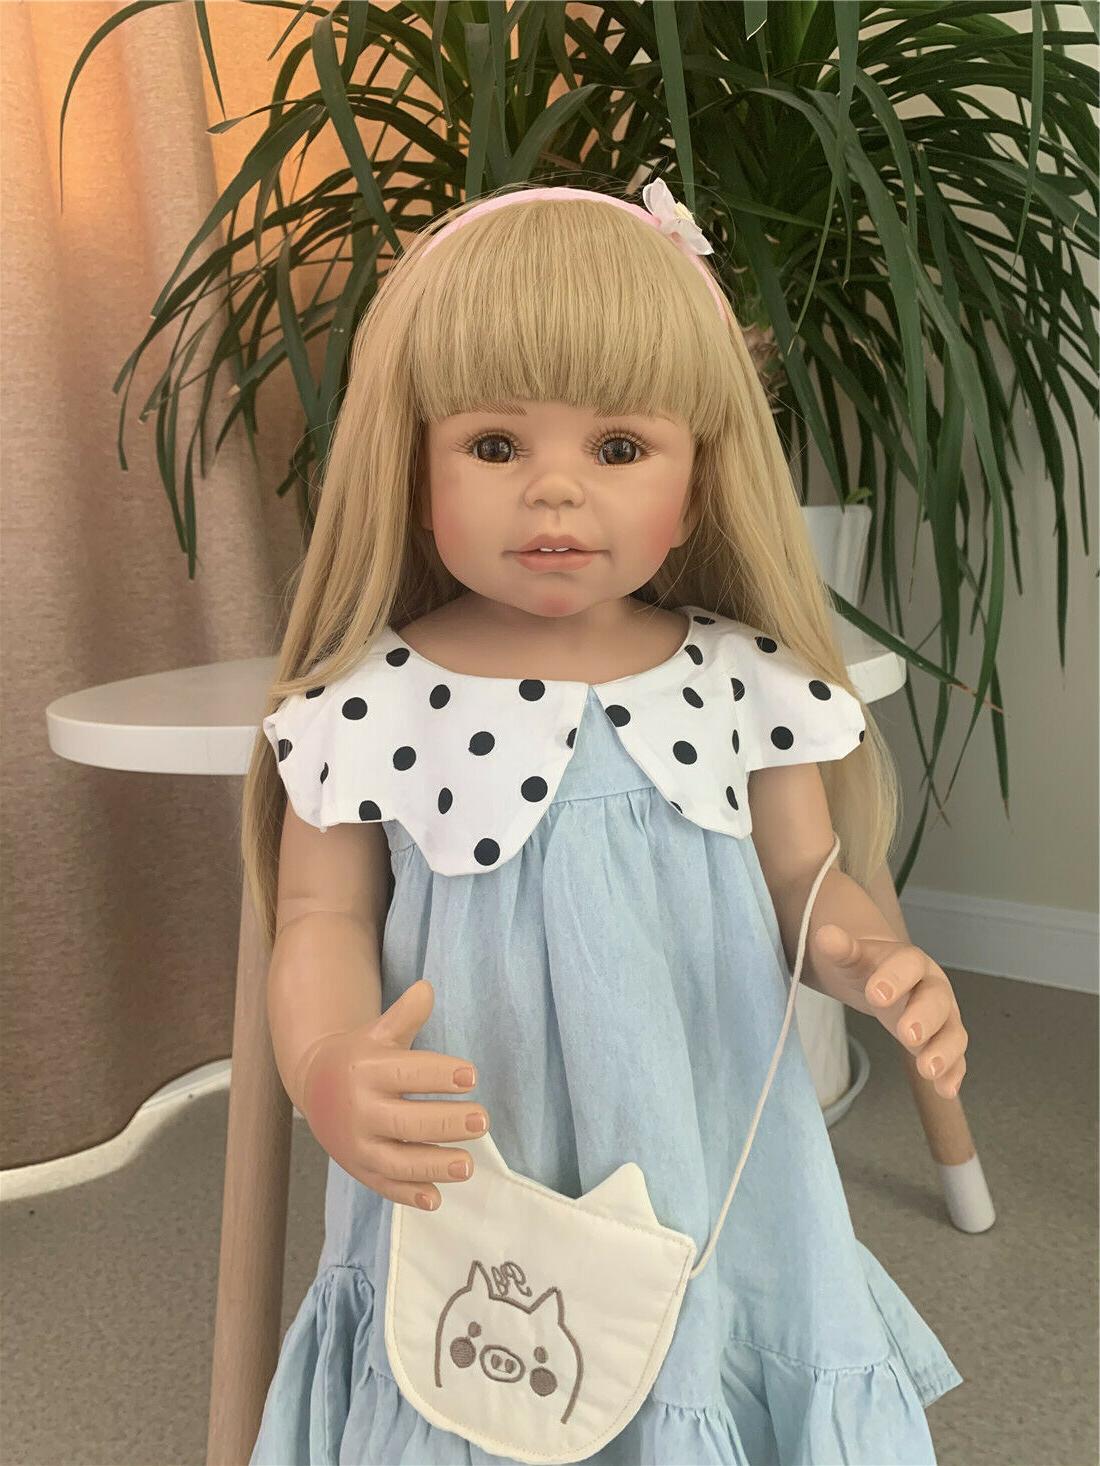 28 inch Reborn Toddler Girls Full Body Vinyl Toys Reborn Bab